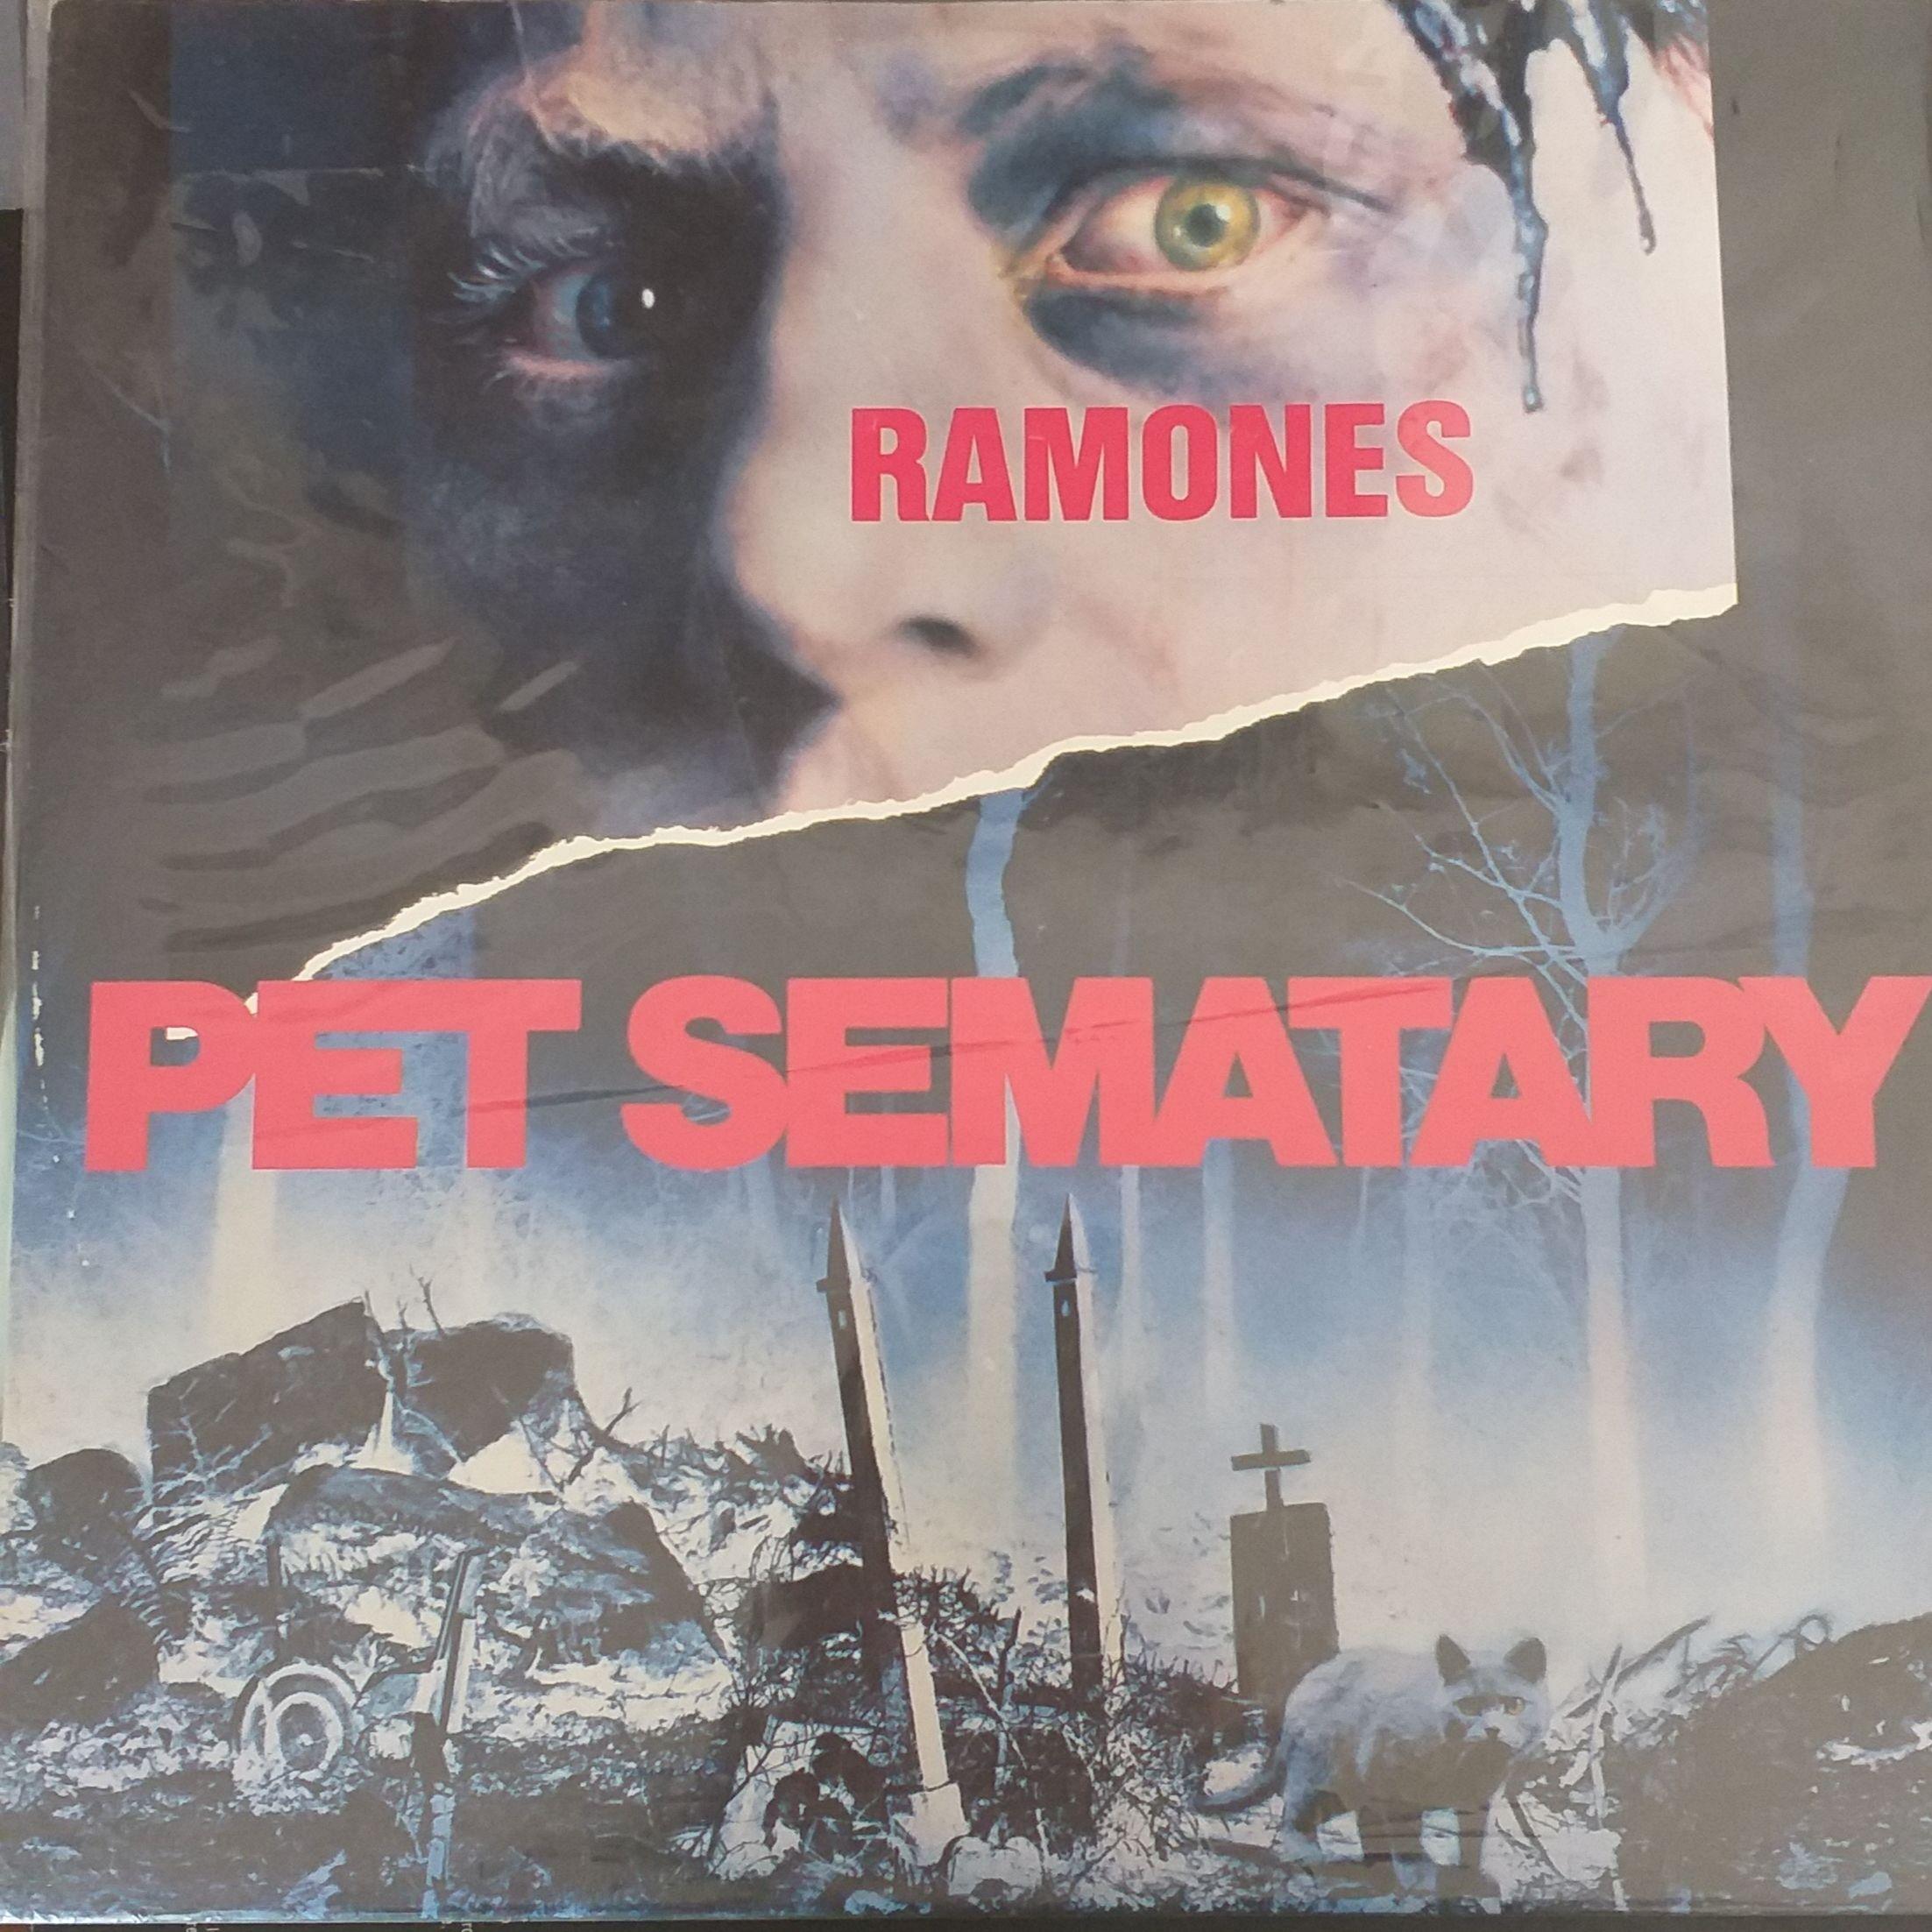 The ramones Pet sematary LP undefined